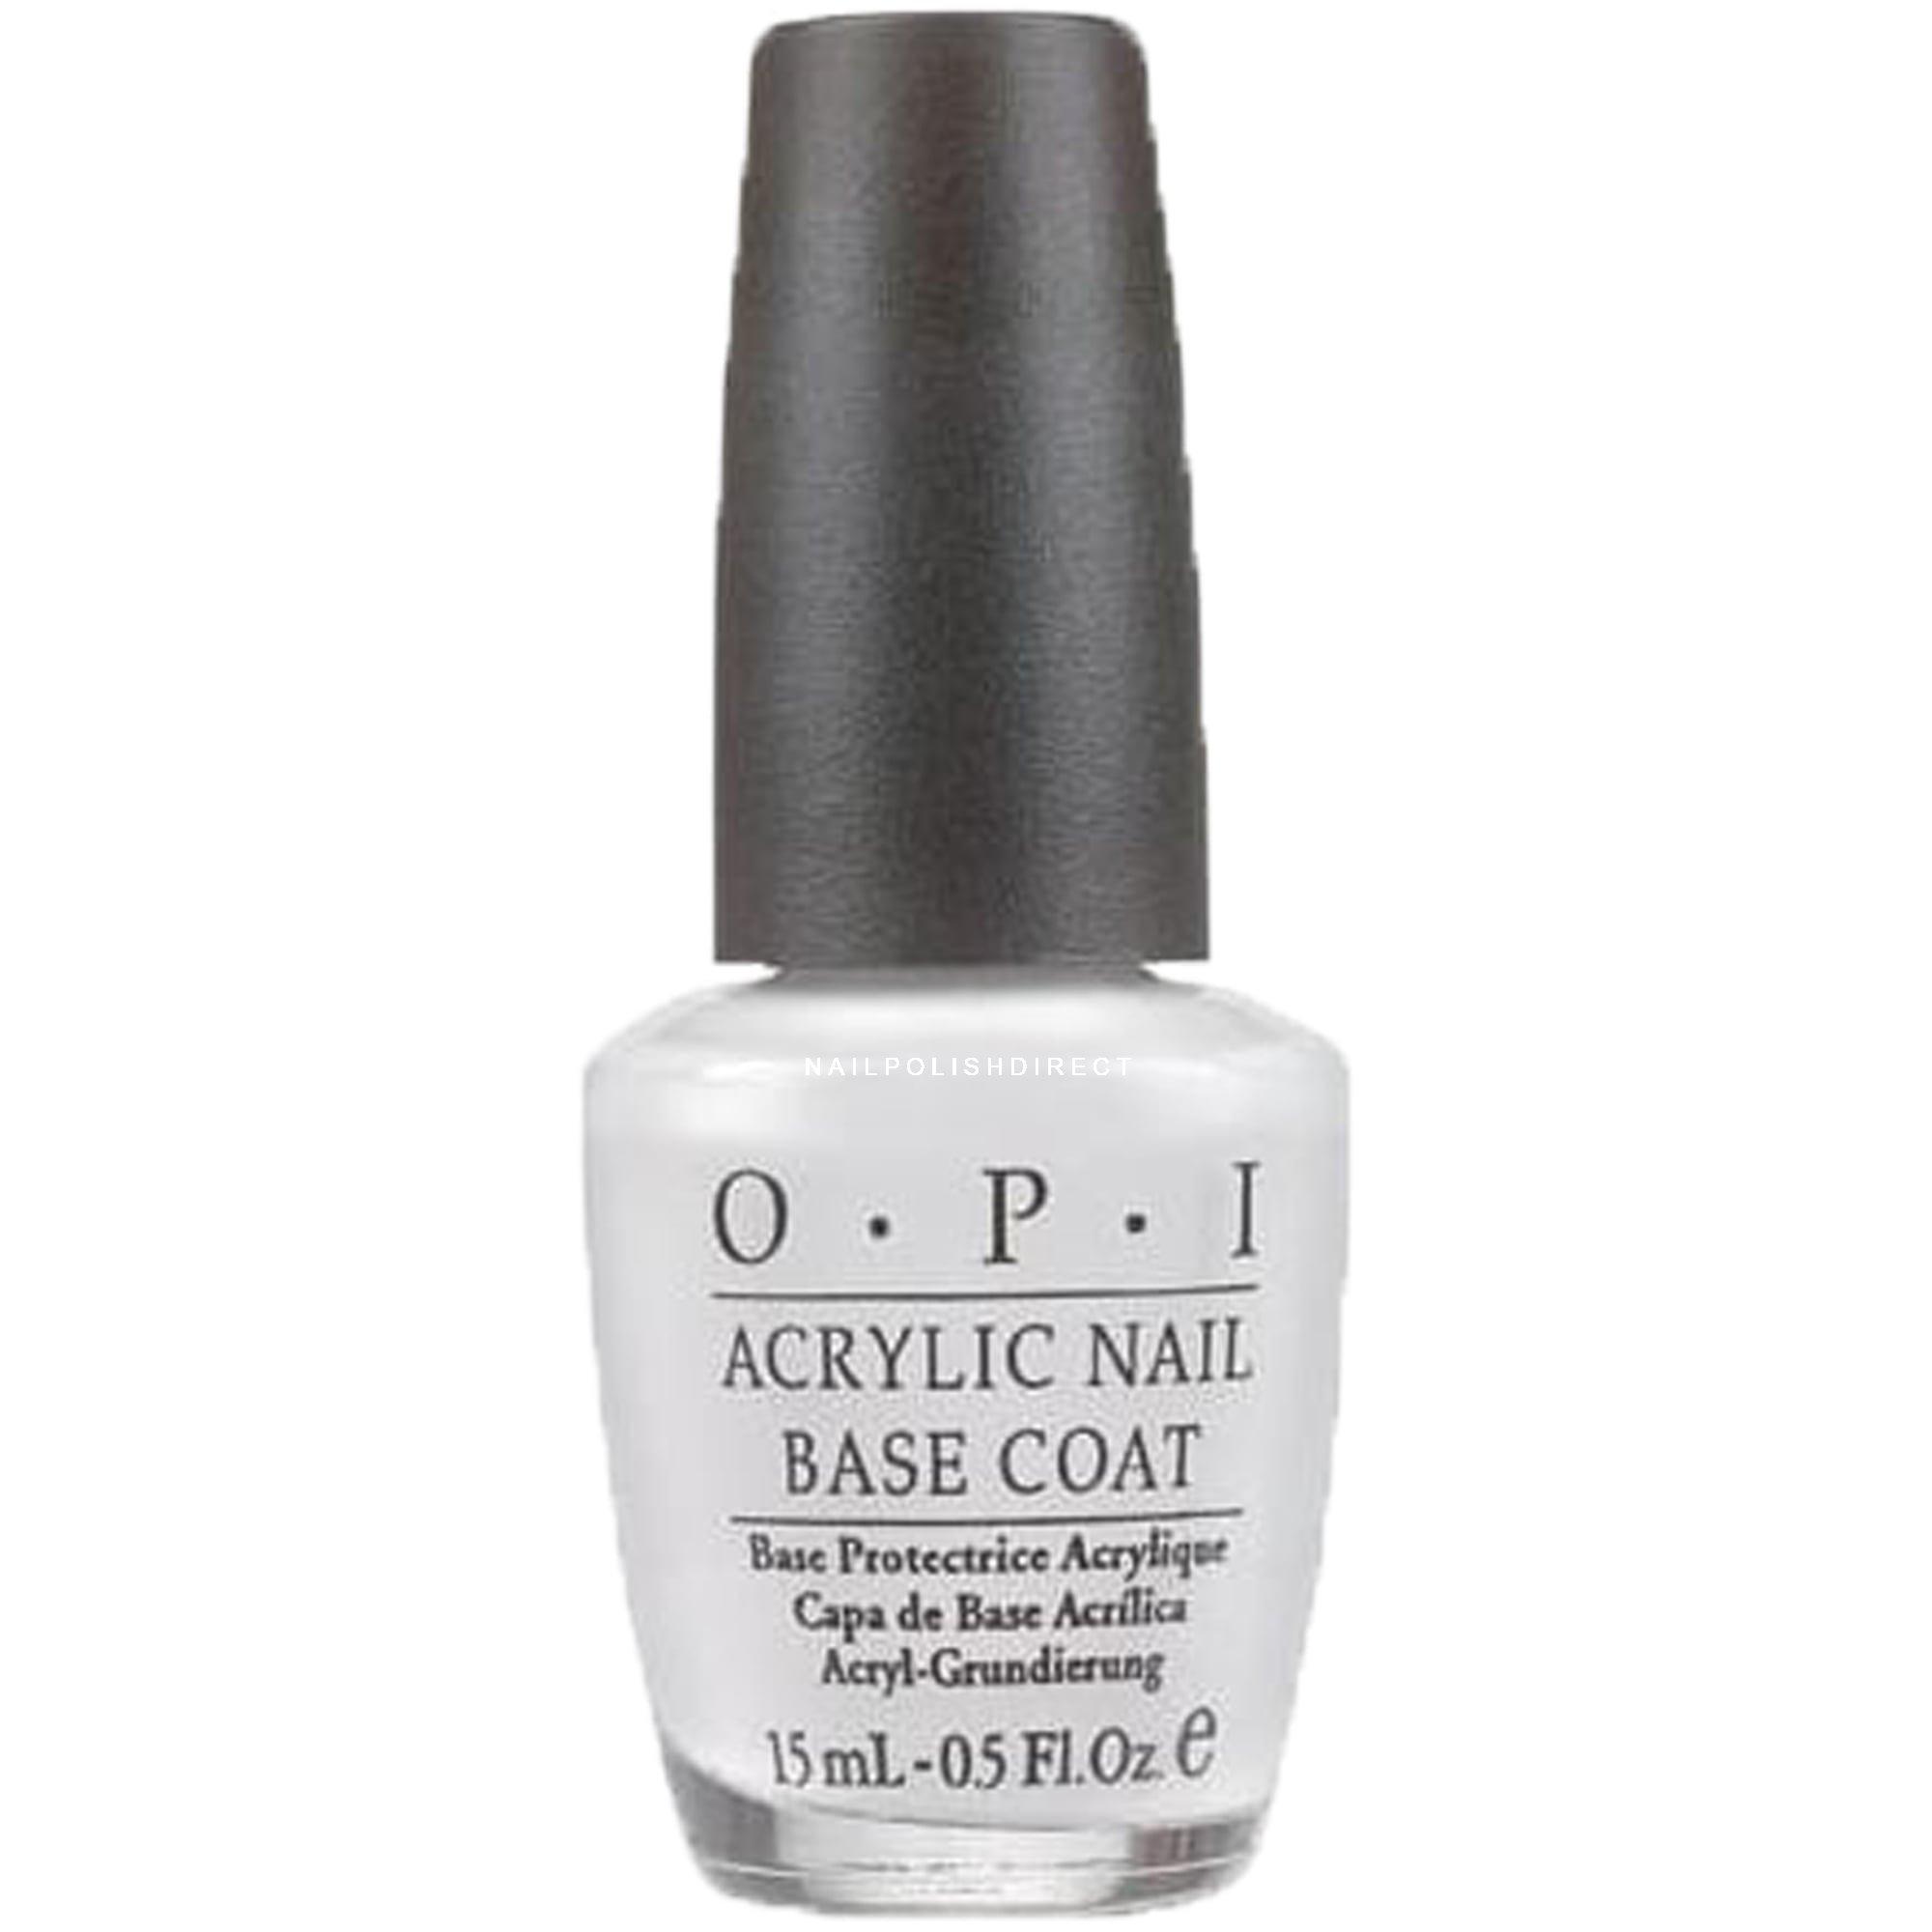 Base Coat Nail Polish: OPI Acrylic Nail Base Coat (NT T20) 15ml